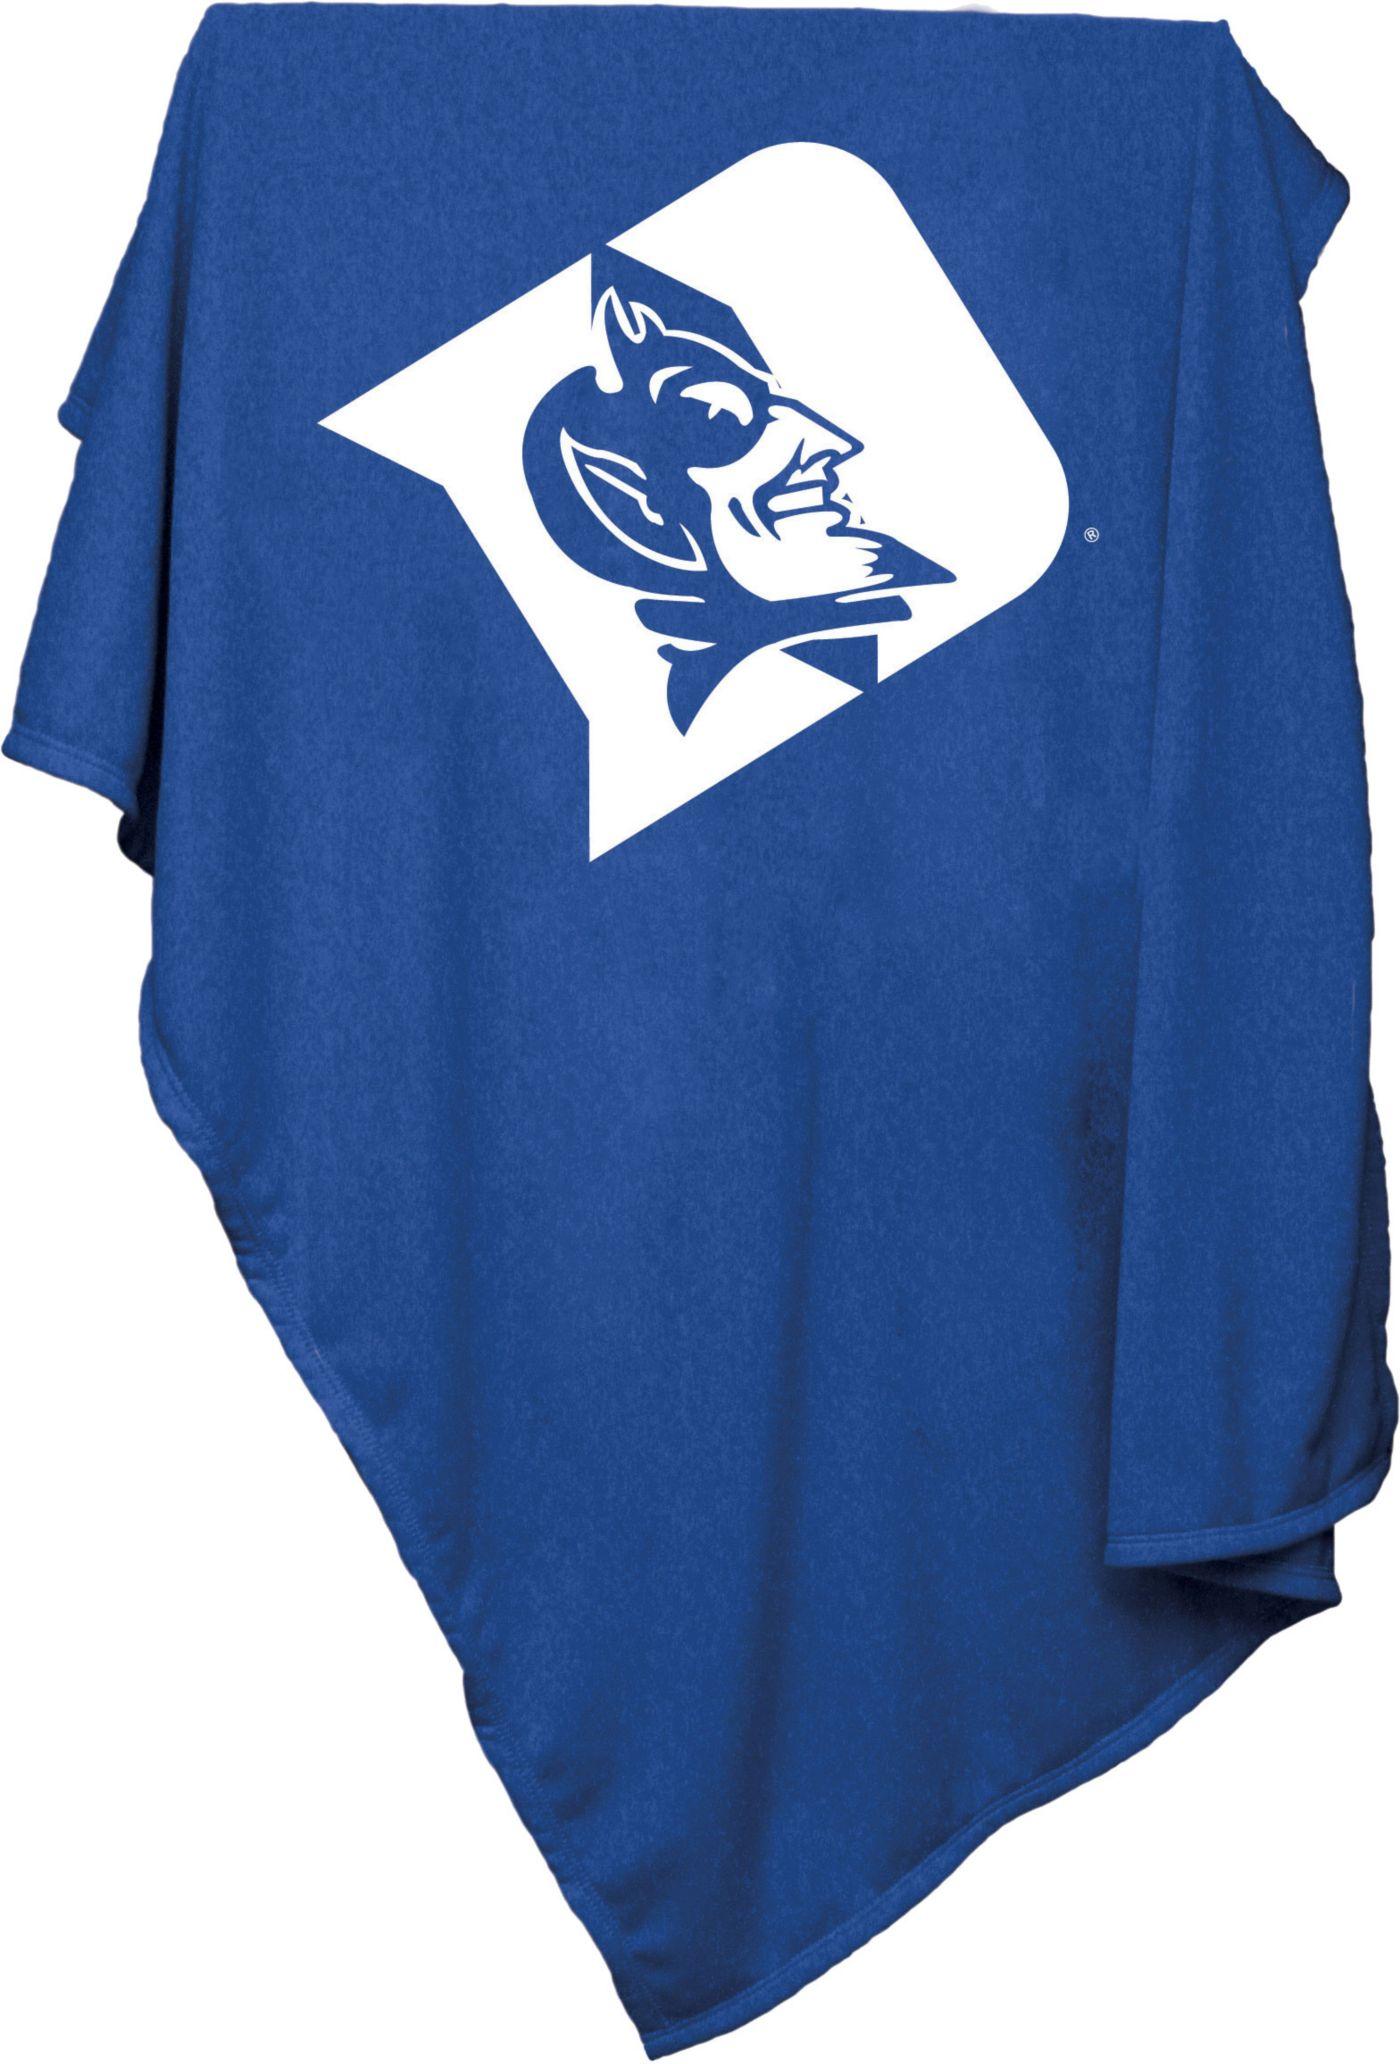 Duke Blue Devils Sweatshirt Blanket